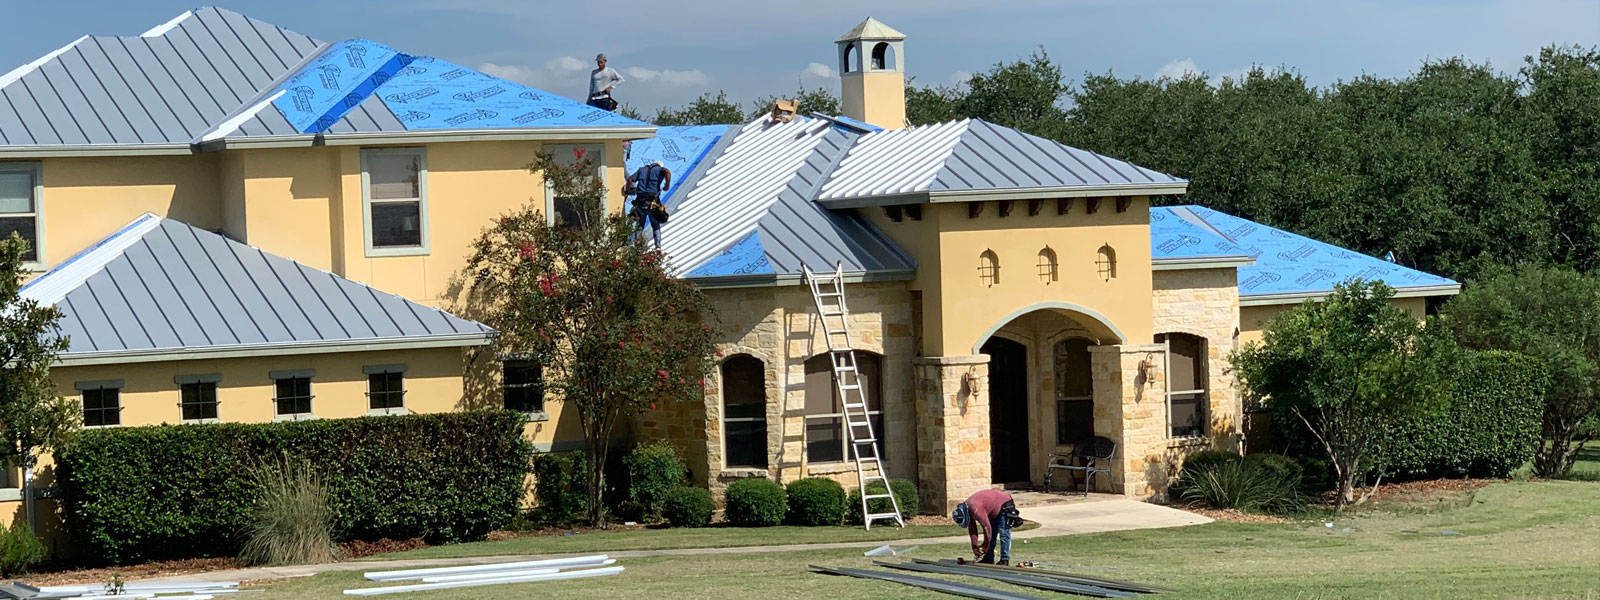 Bear Roofing metal roofing job